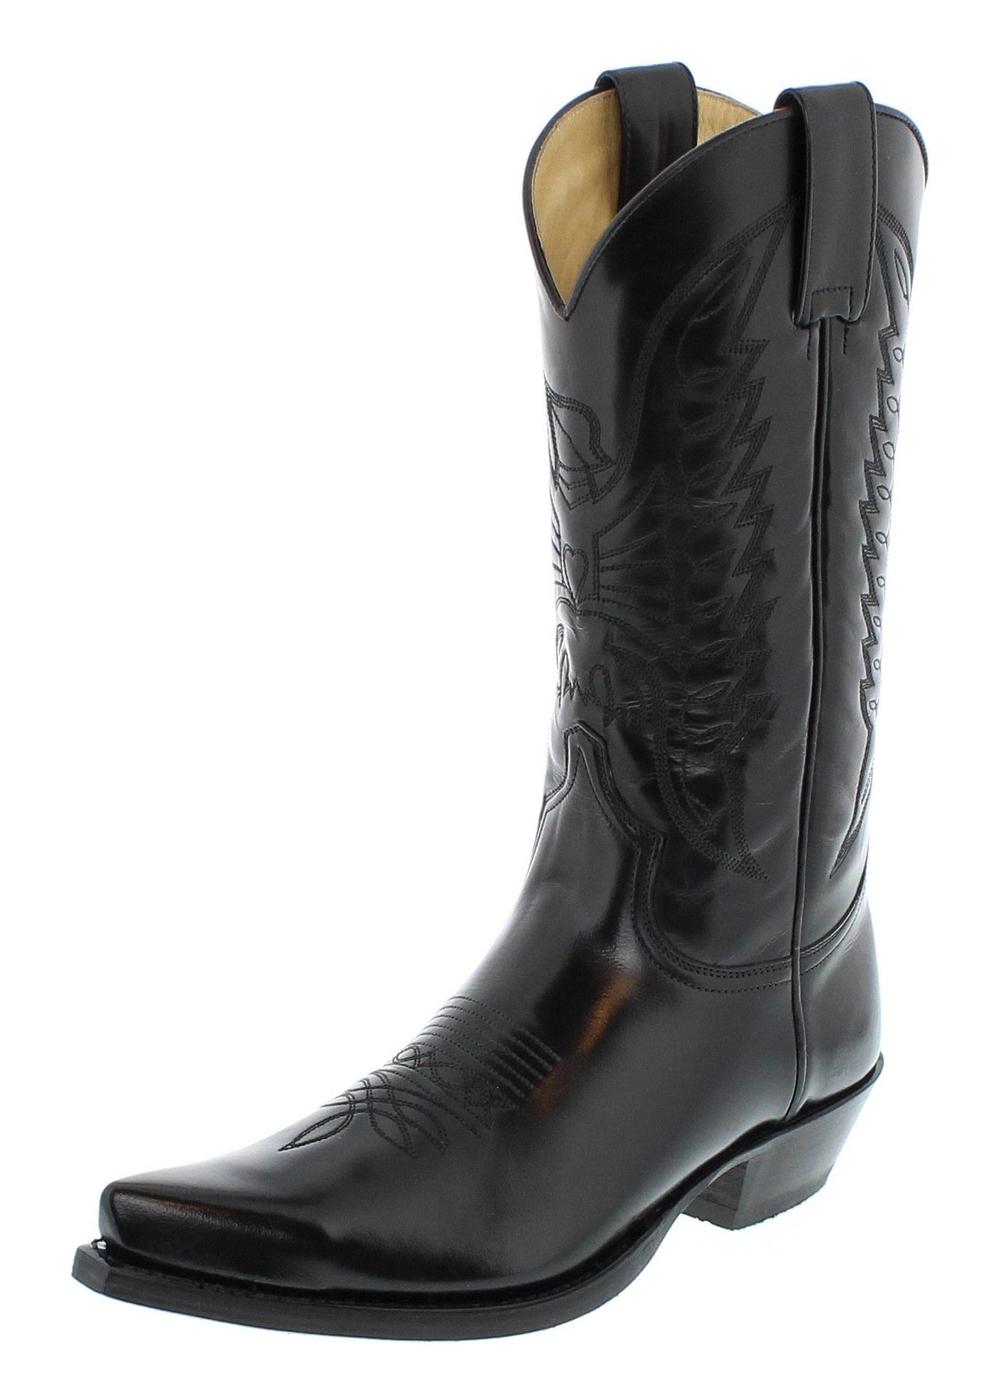 Sendra Boots 2073 Florentic Negro Western boot - Black